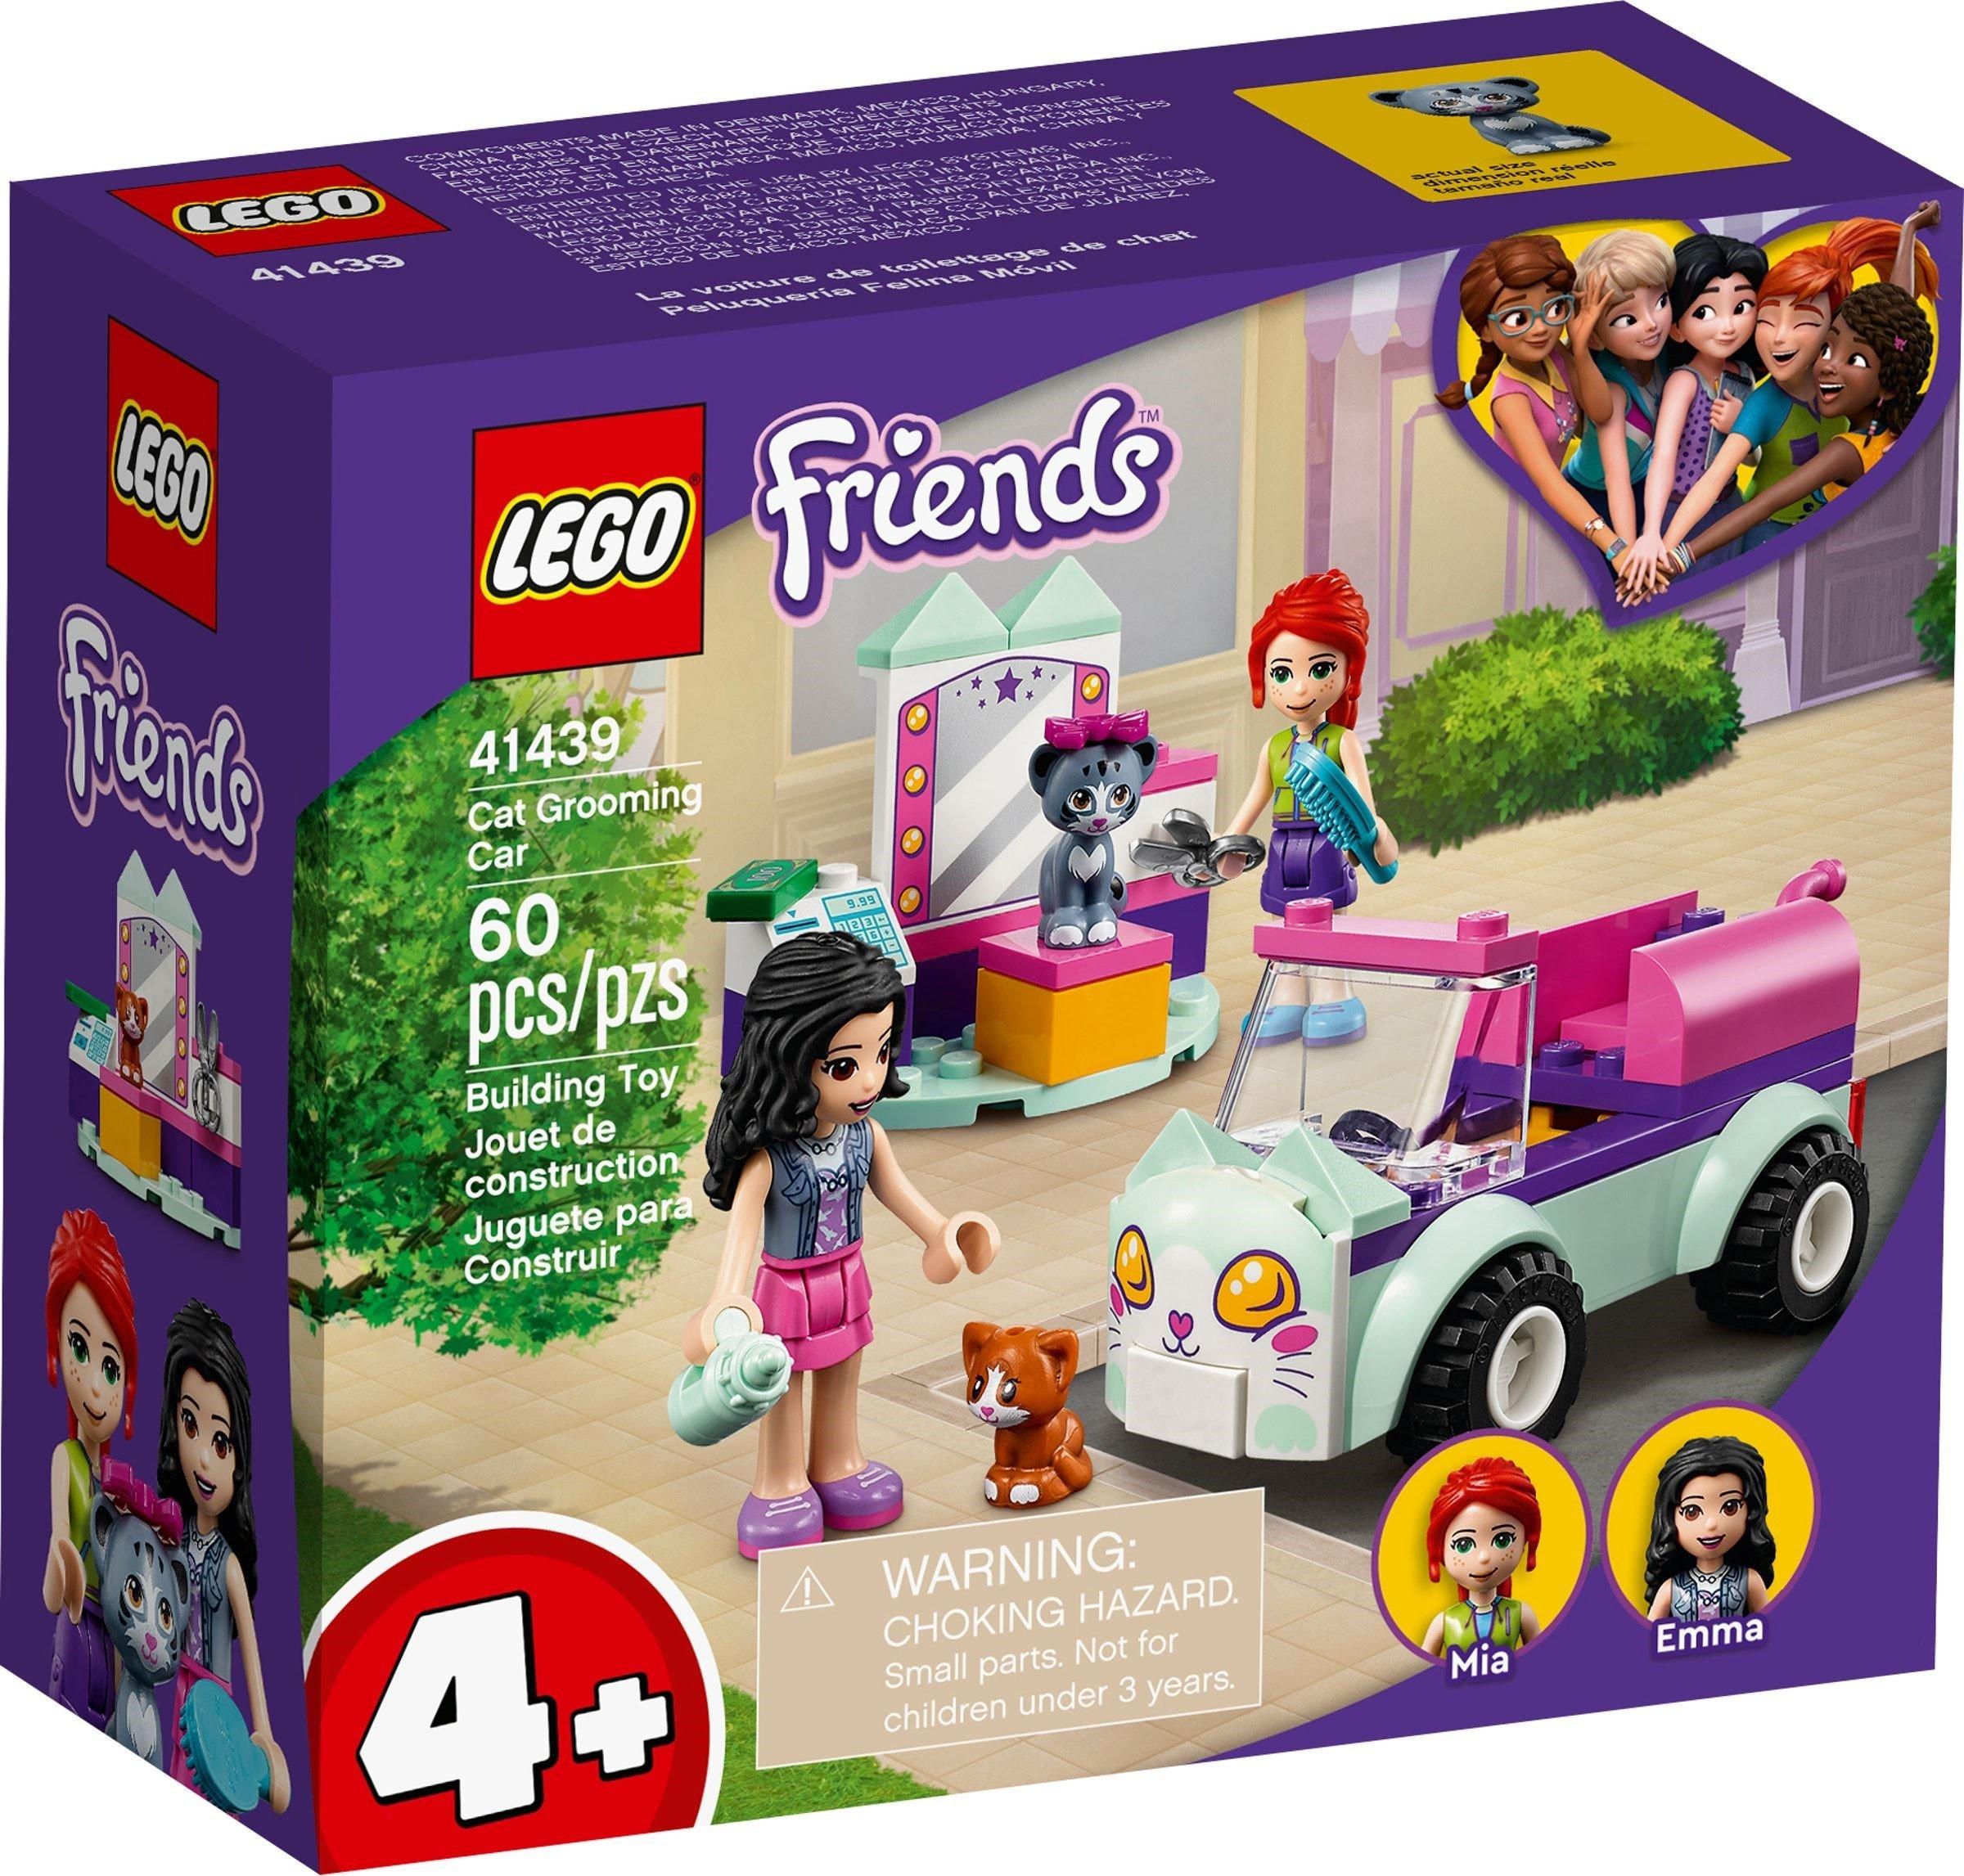 LEGO Friends - Cat Grooming Car (41439)